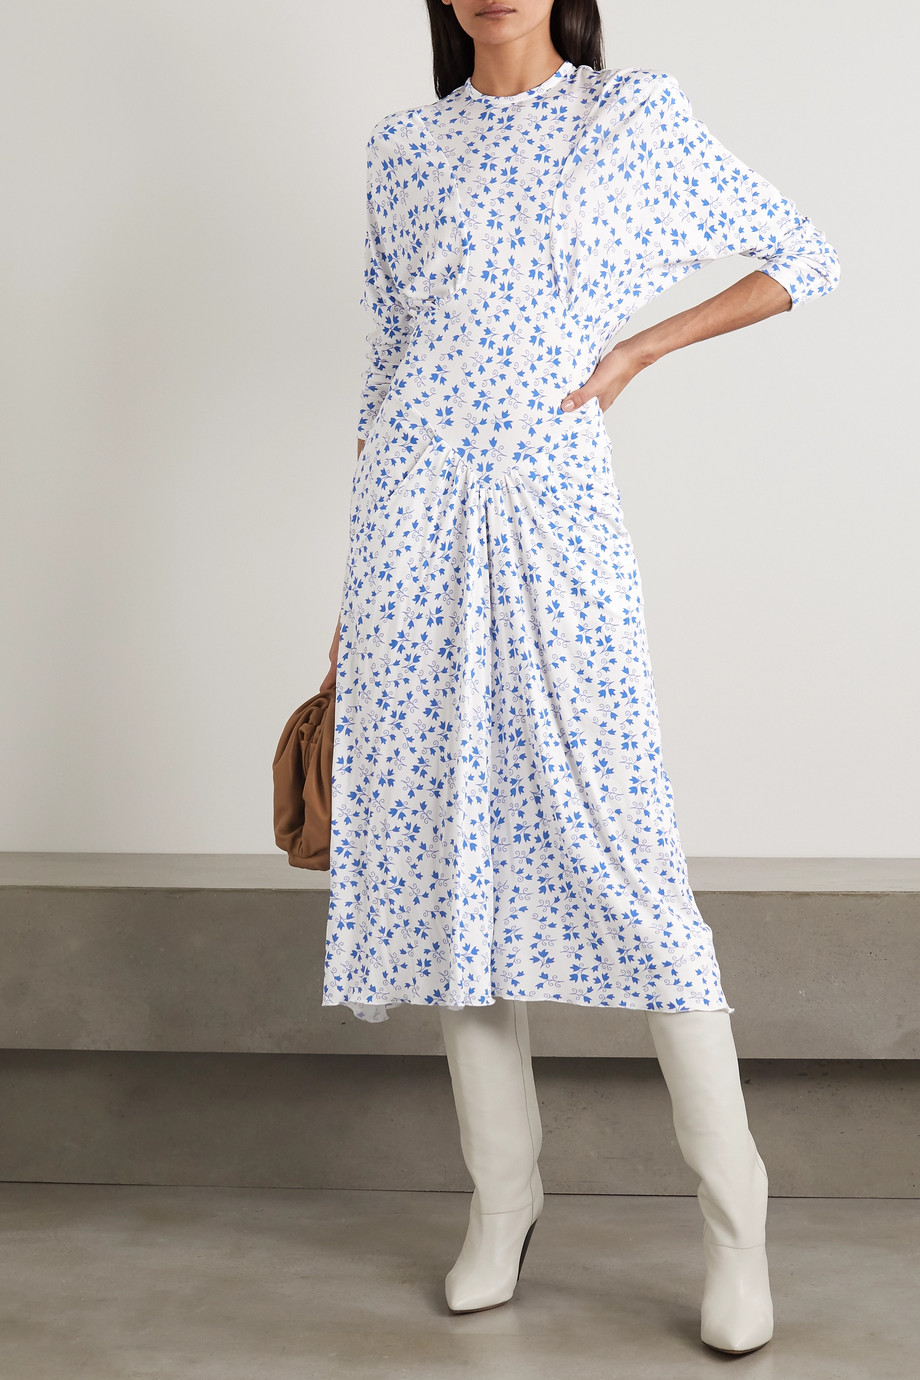 Isabel Marant Telky 花卉印花珠地布中长连衣裙